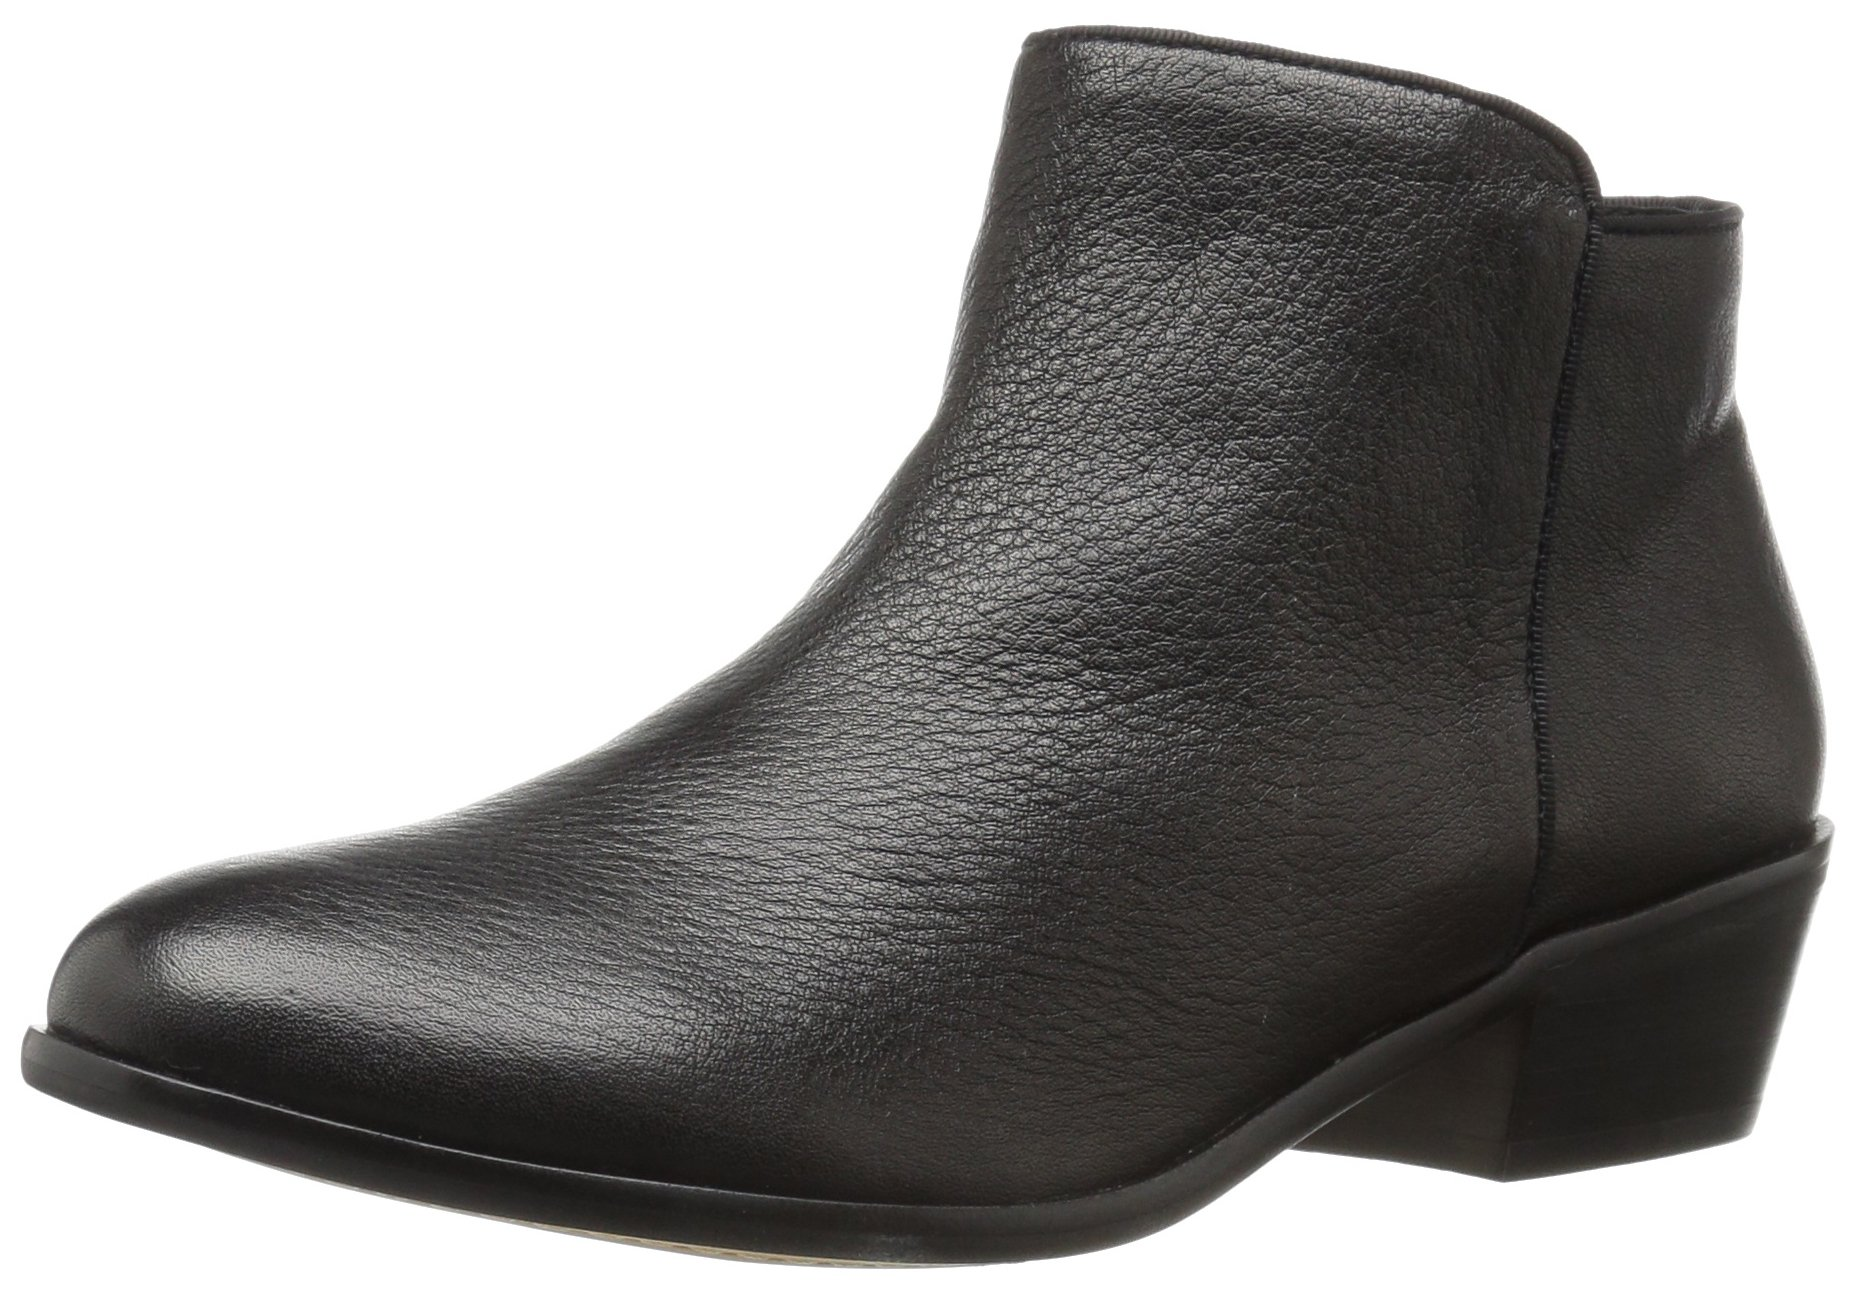 206 Collective Women's Magnolia Low Heel Ankle Bootie, Black, 6 B US